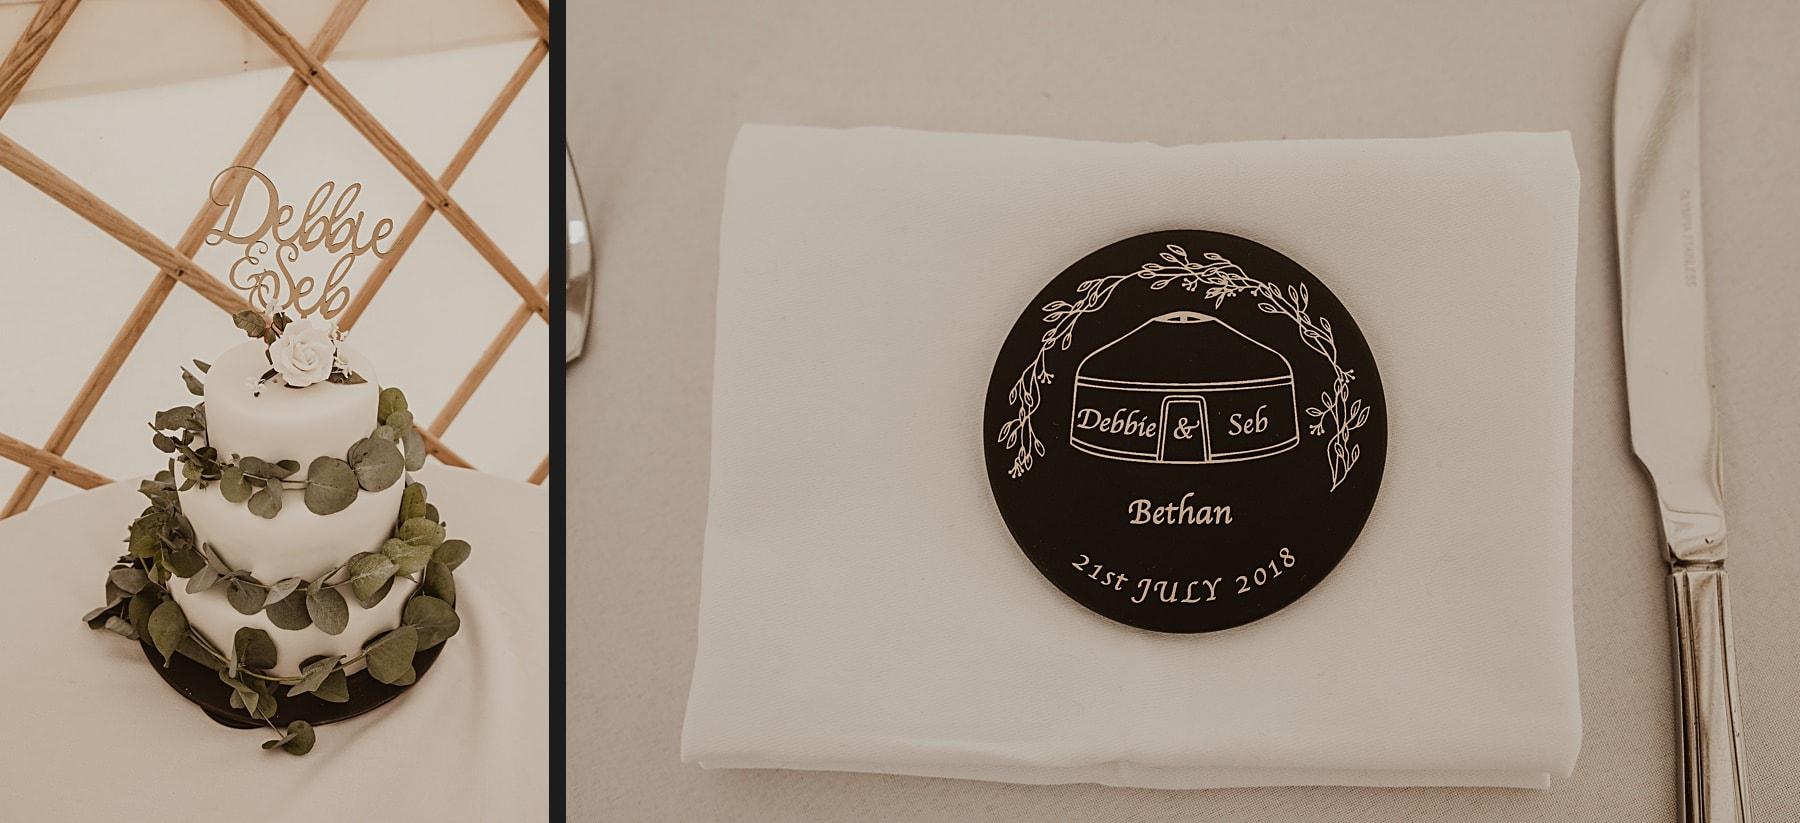 Wedding cake and slate placename